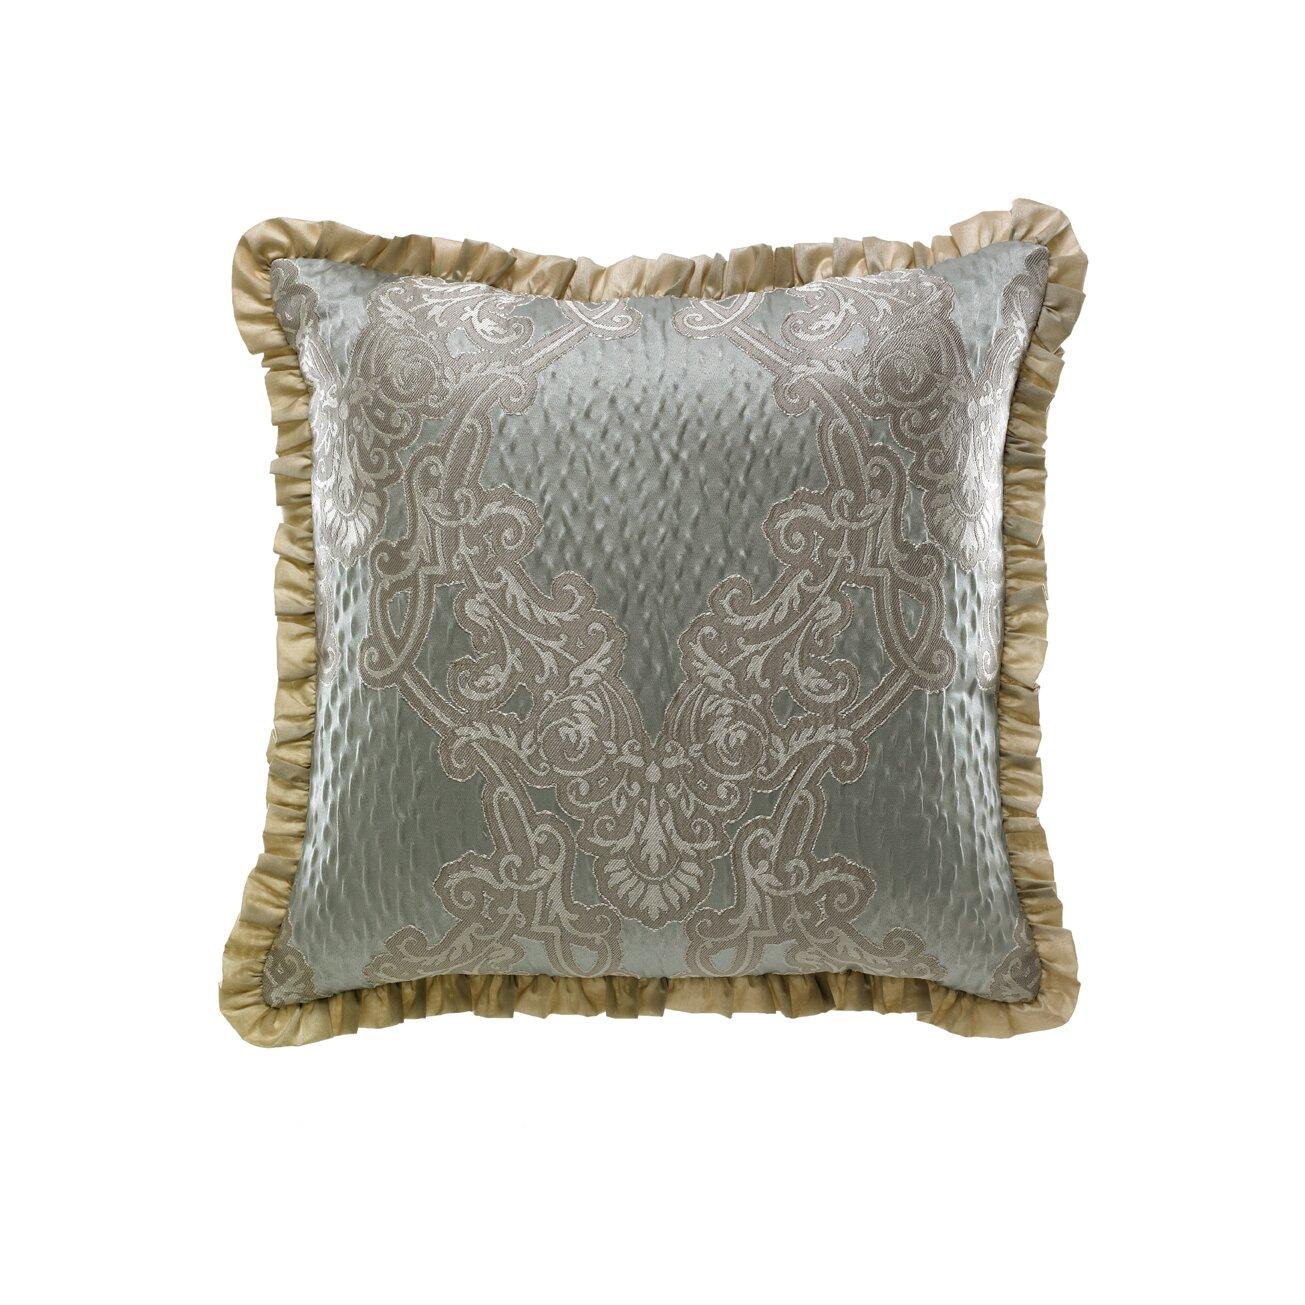 Throw Pillow That Says Home : Croscill Opal Throw Pillow & Reviews Wayfair